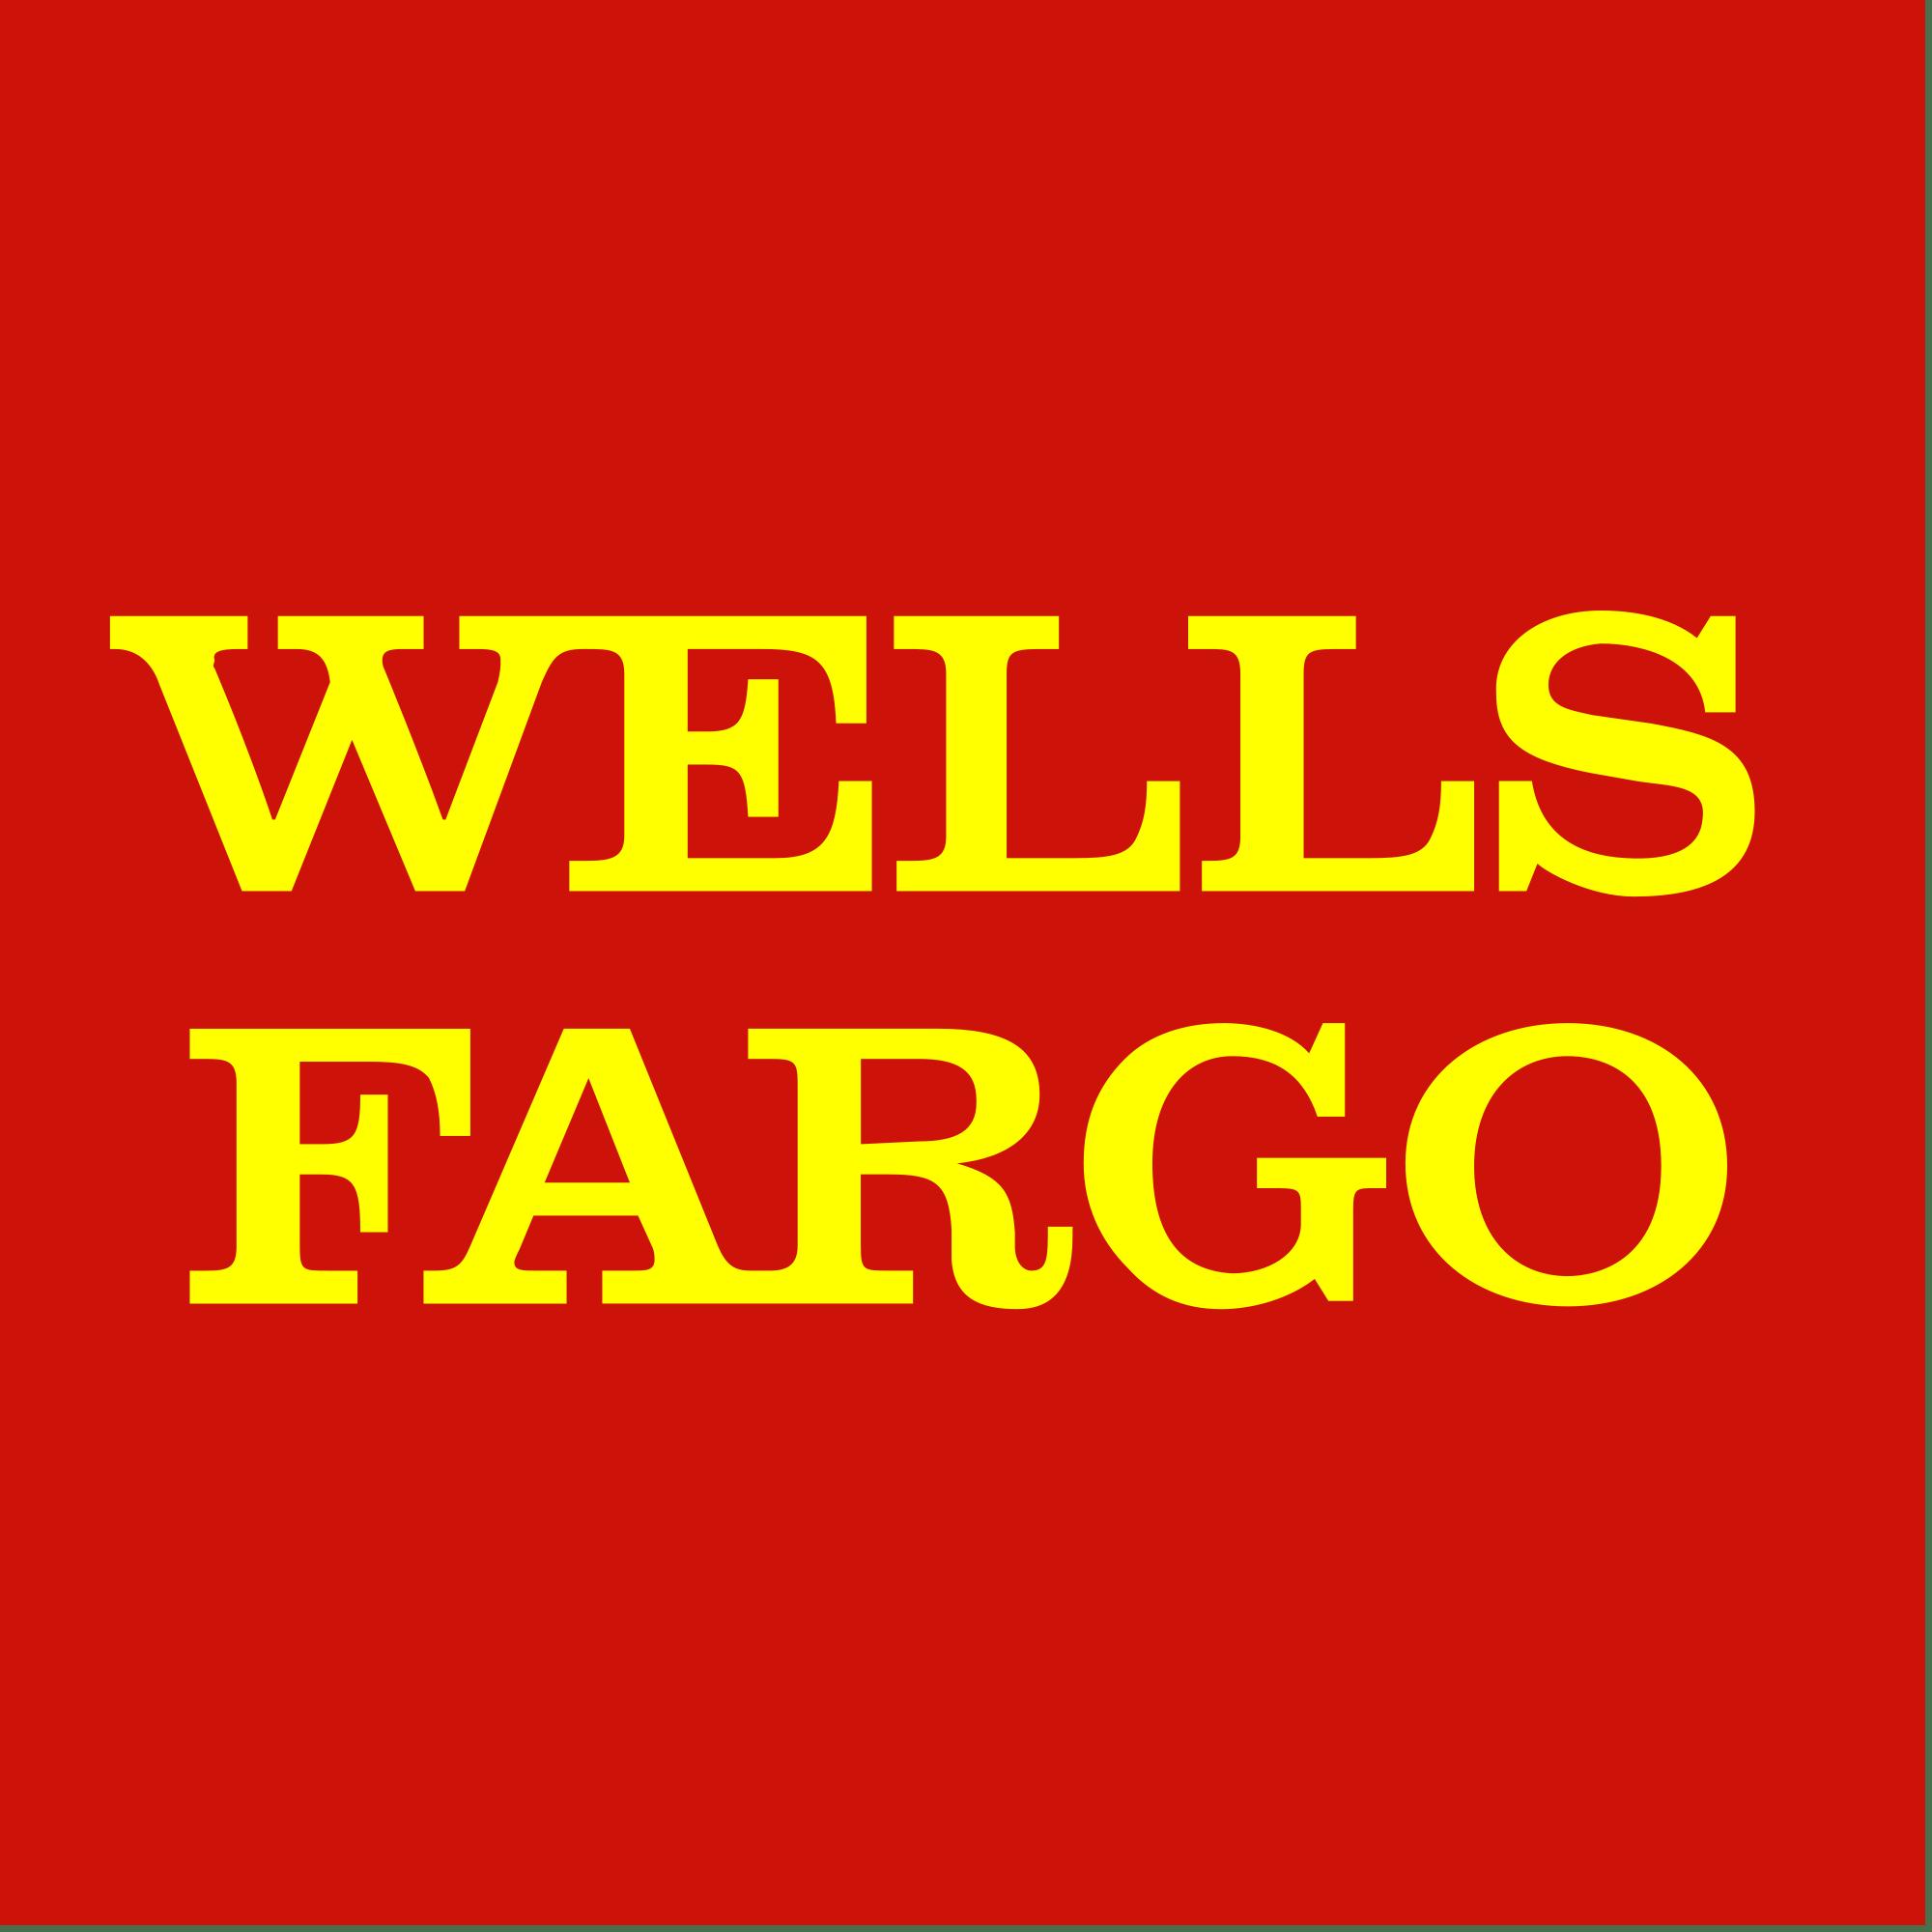 Breathe LA - Logo - Wells Fargo